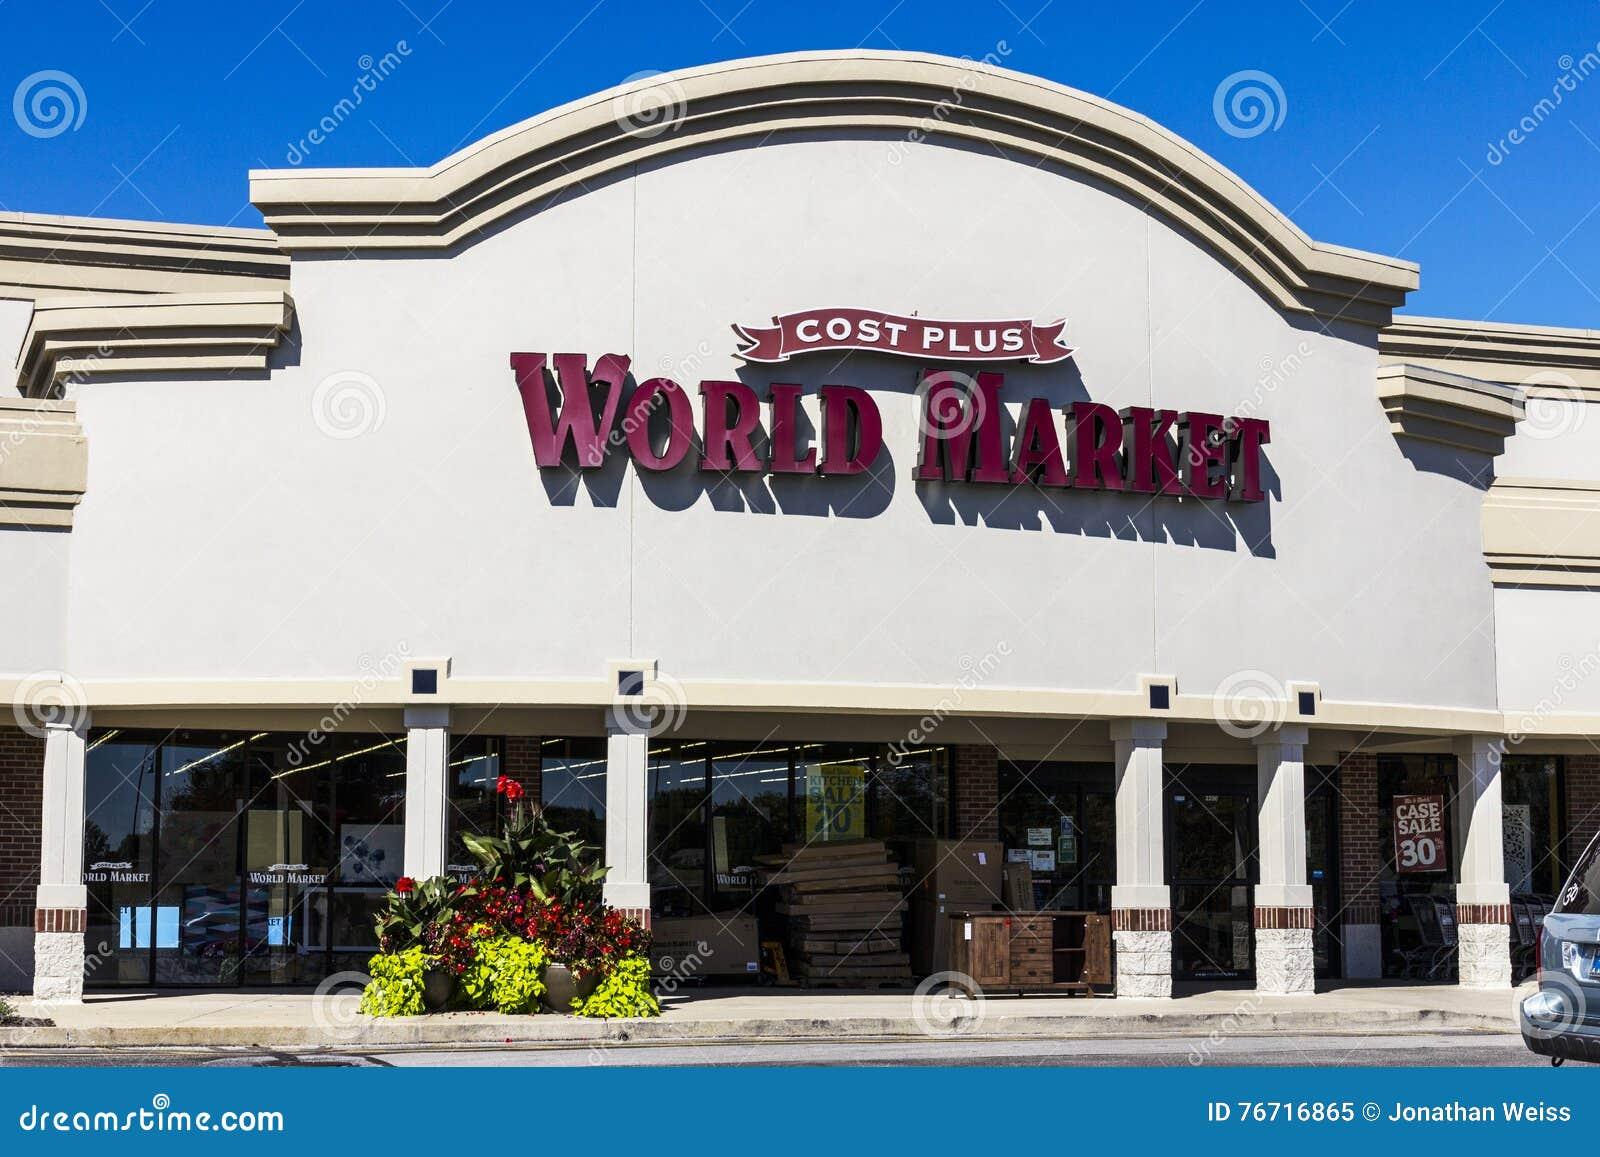 recipe  world market food locations  8. world market food locations